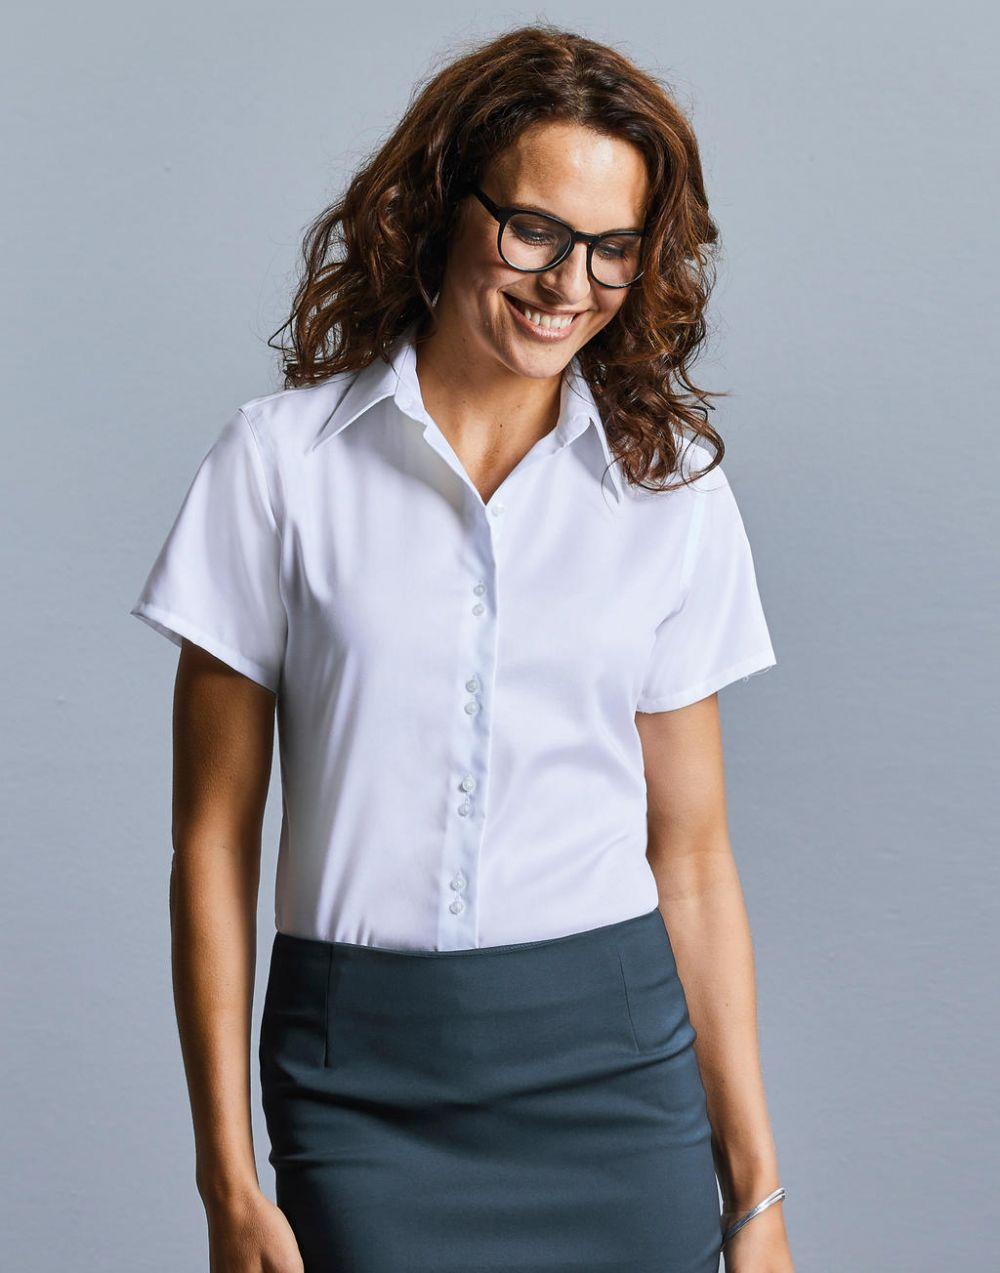 Camisas manga corta russell ultimate mujer con impresión imagen 1